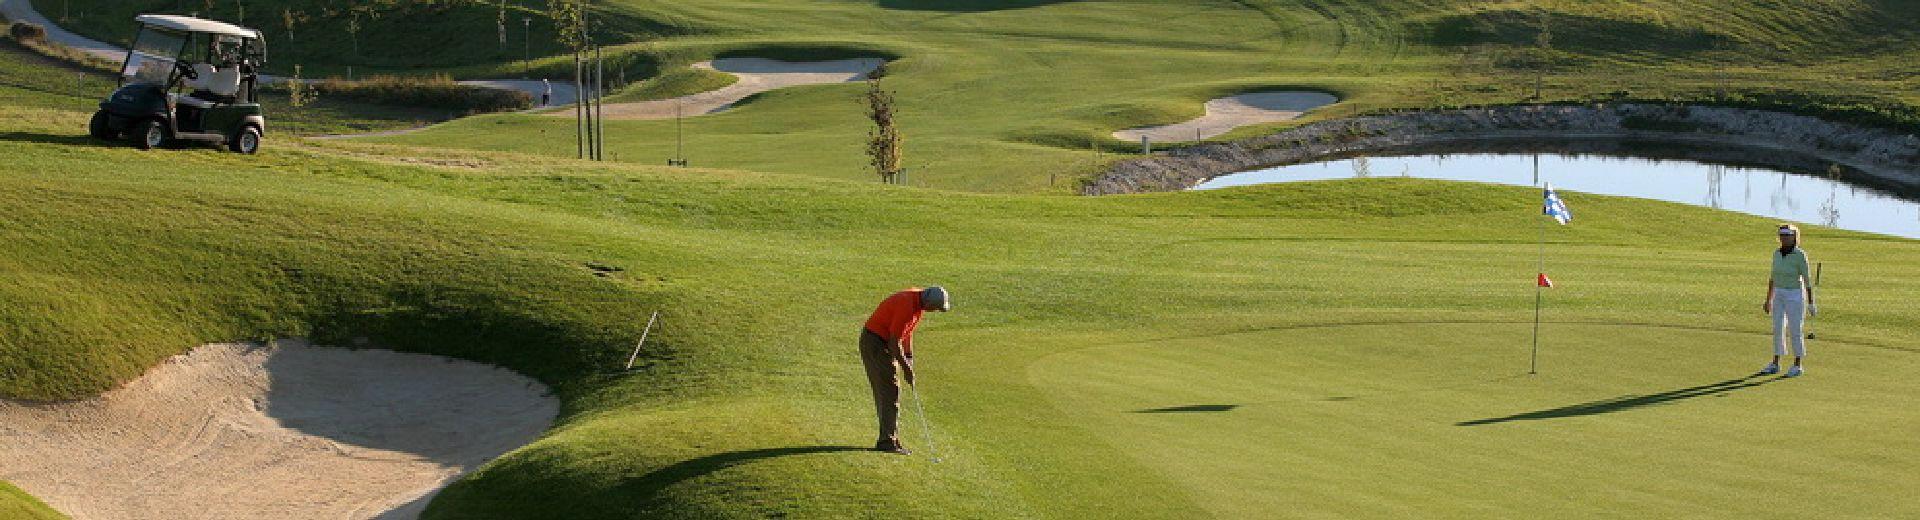 Golfclub am Nationalpark Bayerischer Wald e.V.